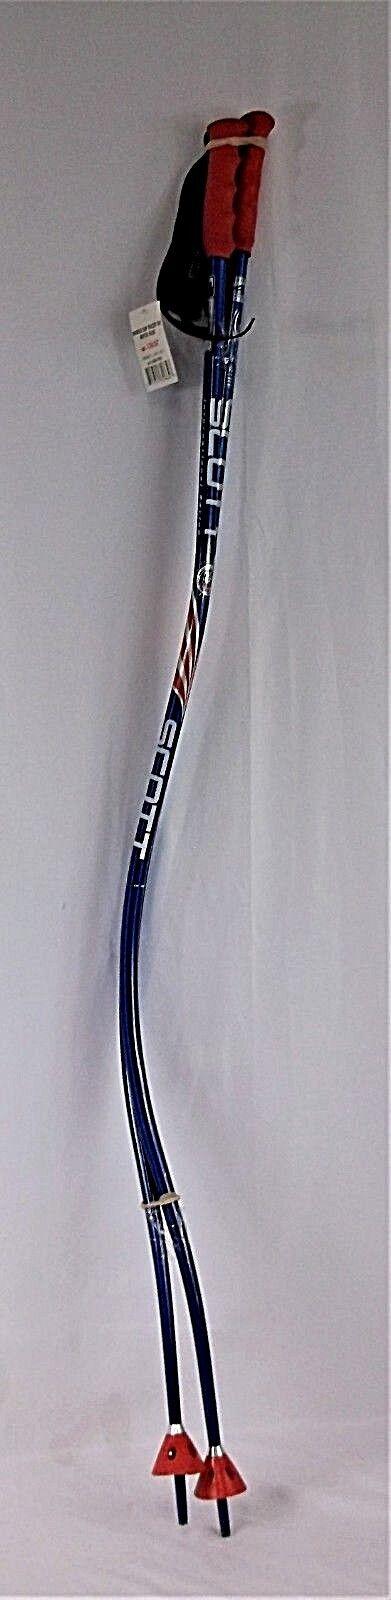 Down hill racing Ski poles, SCOTT Bent bluee Race poles sizes 44